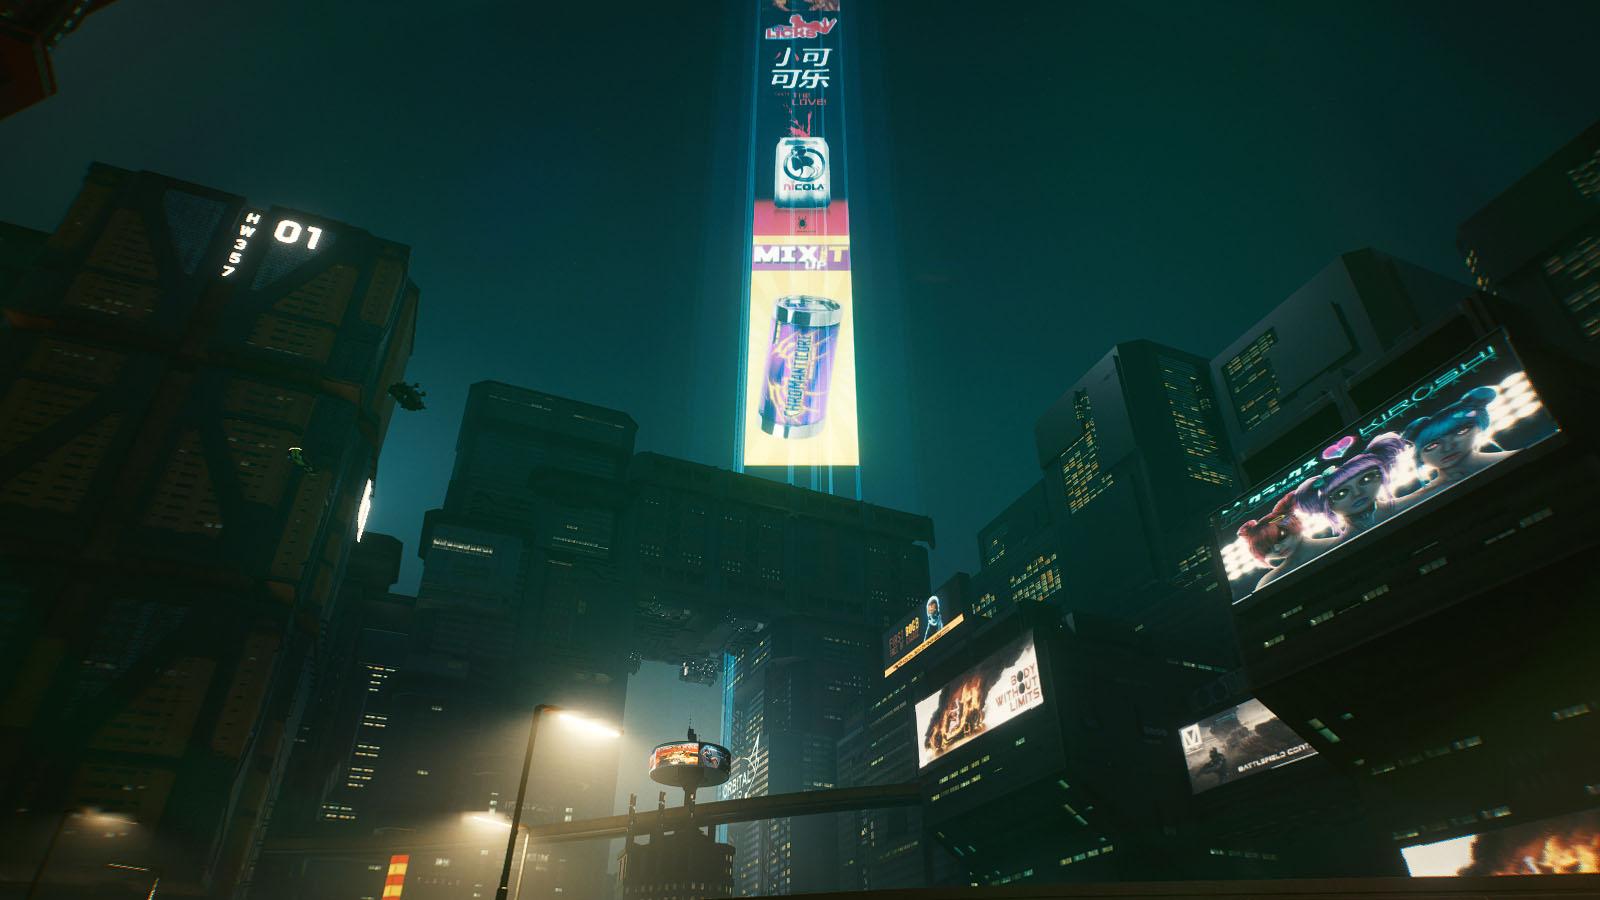 Night City by night